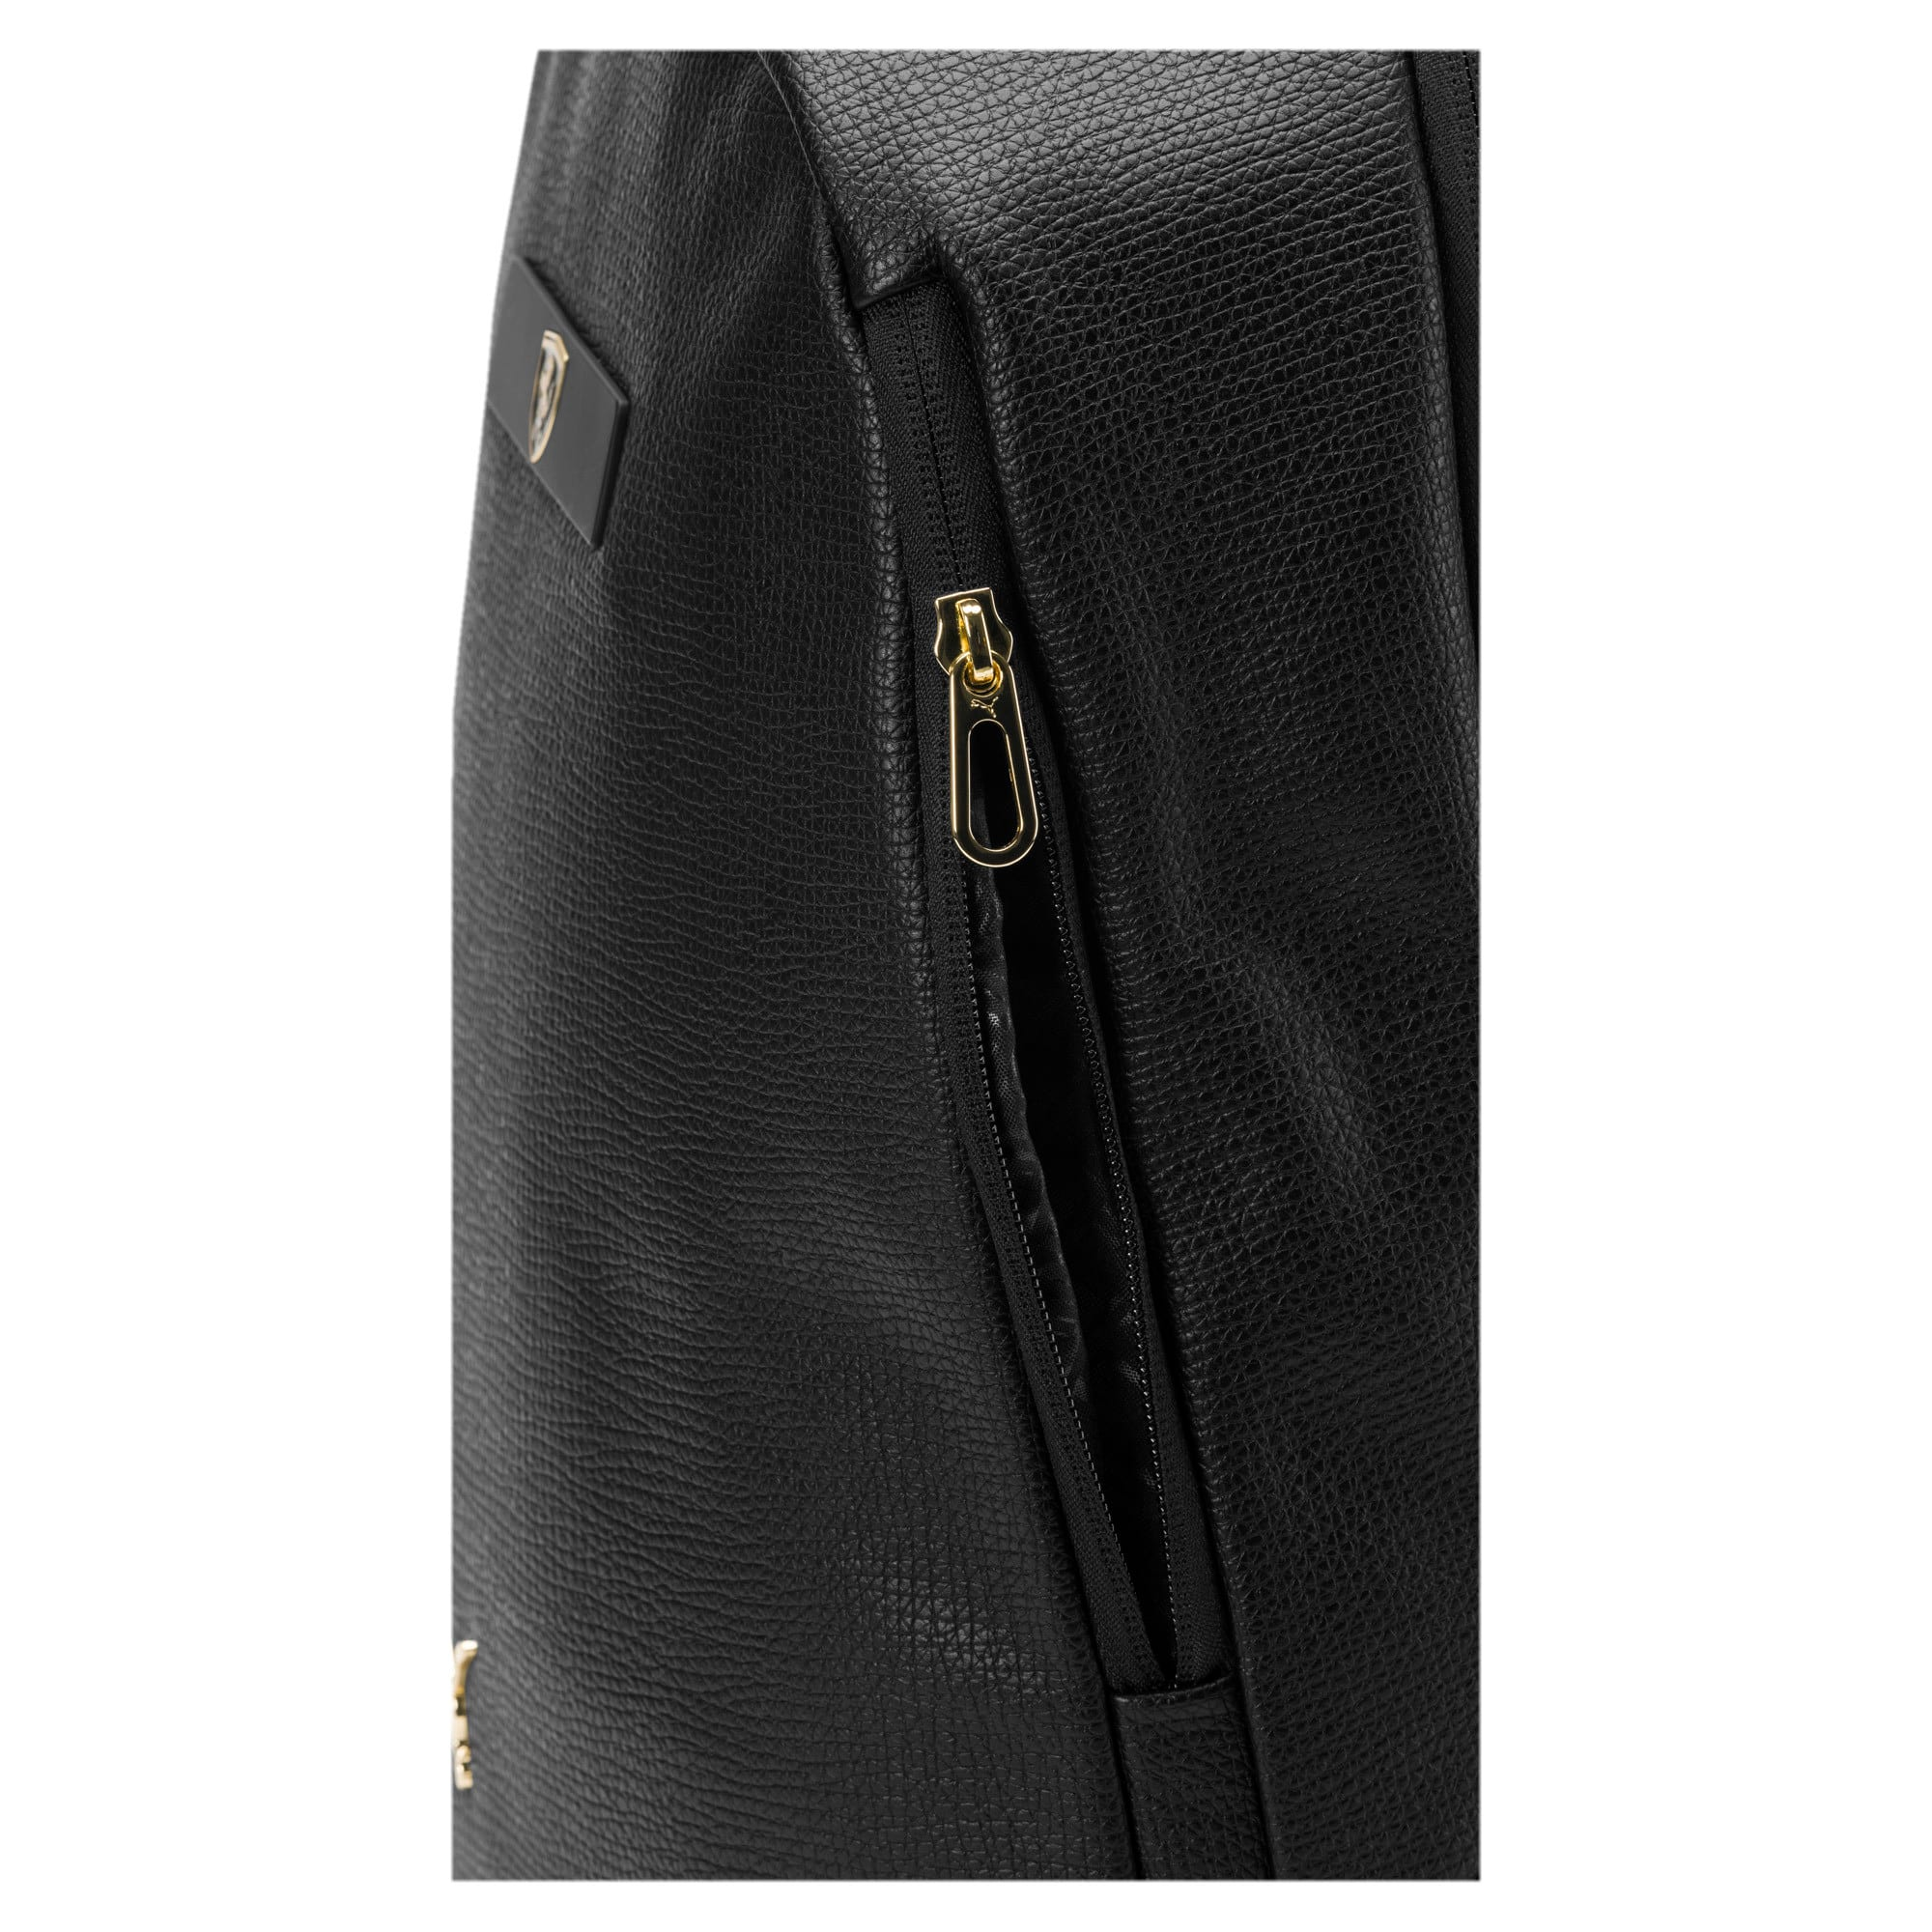 Thumbnail 4 of Ferrari Lifestyle Zainetto Backpack, Puma Black, medium